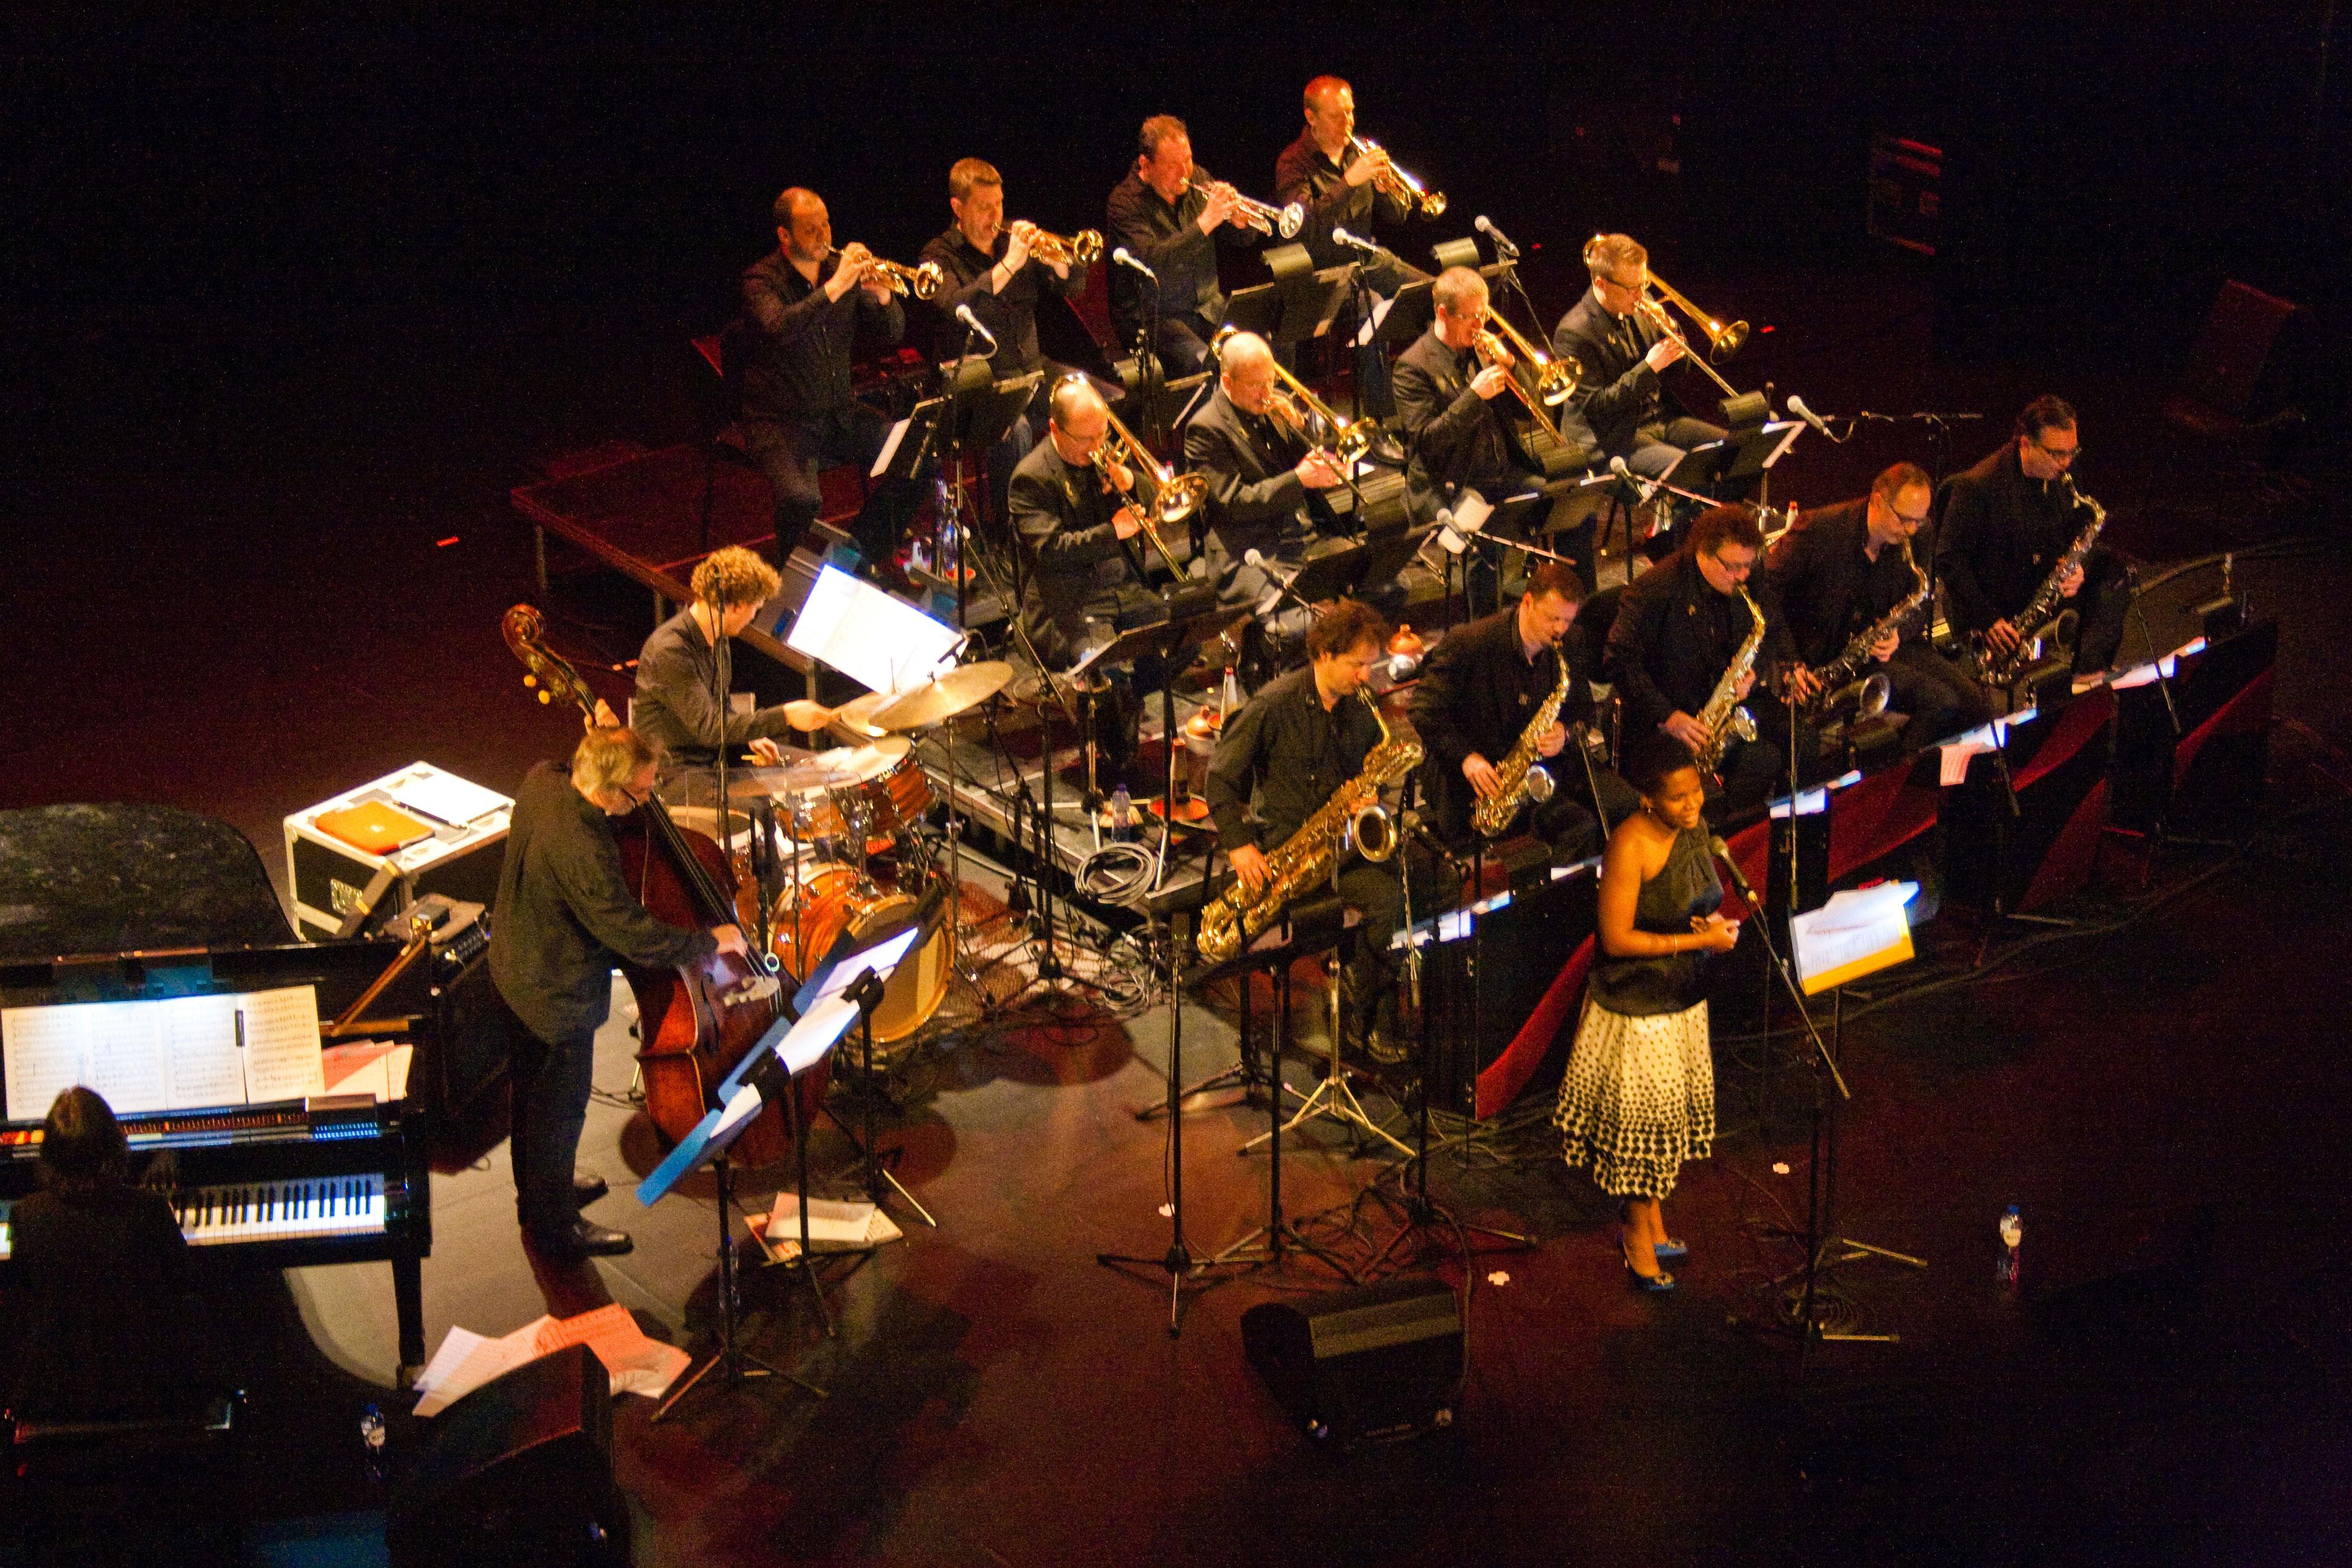 https://upload.wikimedia.org/wikipedia/commons/9/9b/New_York%2C_City_of_Jazz._BJO_with_Tutu_Puoane.jpg